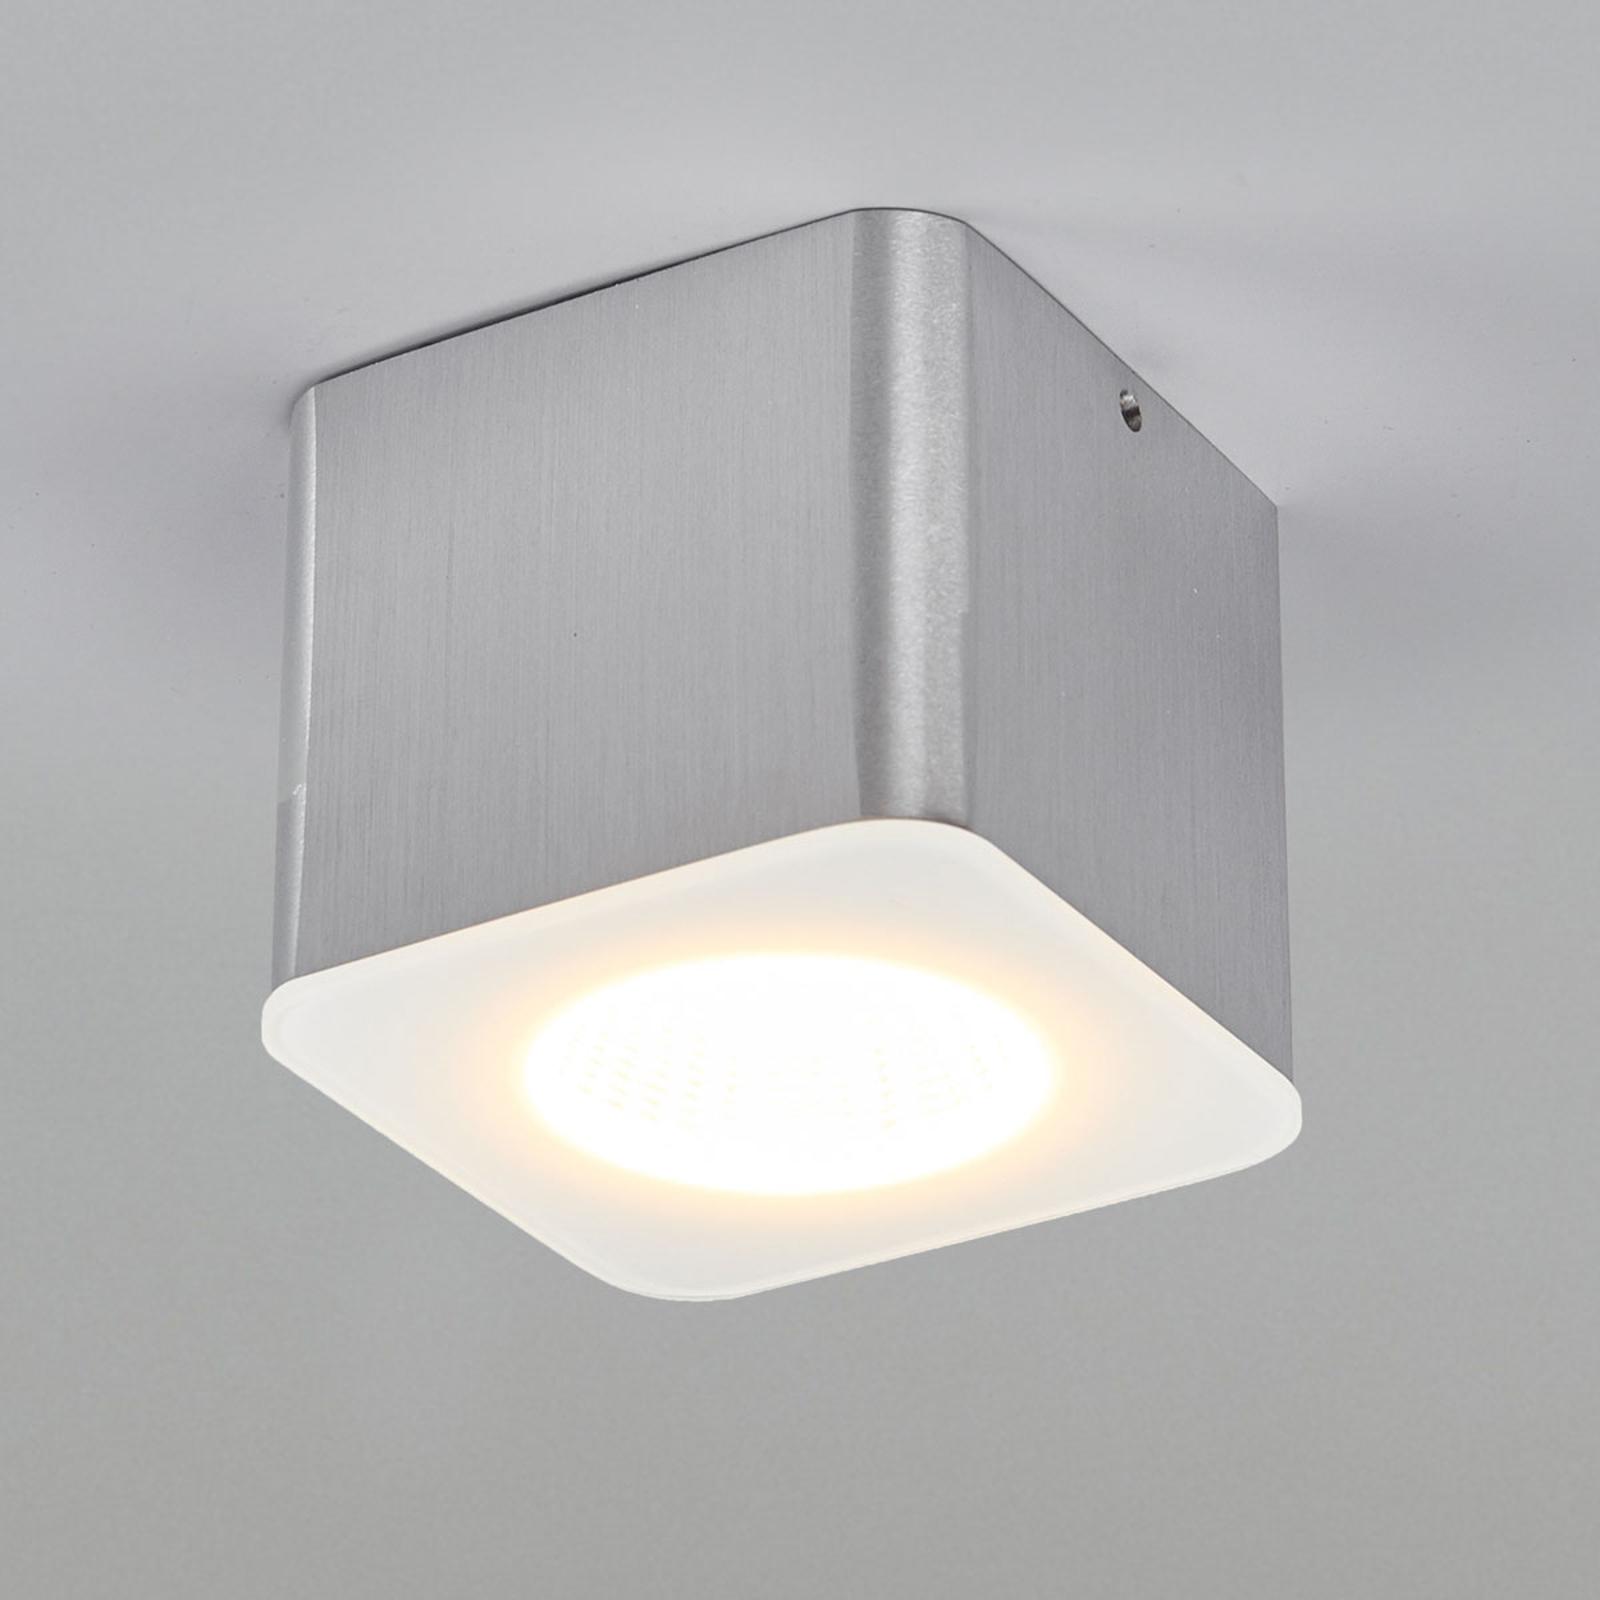 Helestra Oso LED-takspot, kantet, matt alu